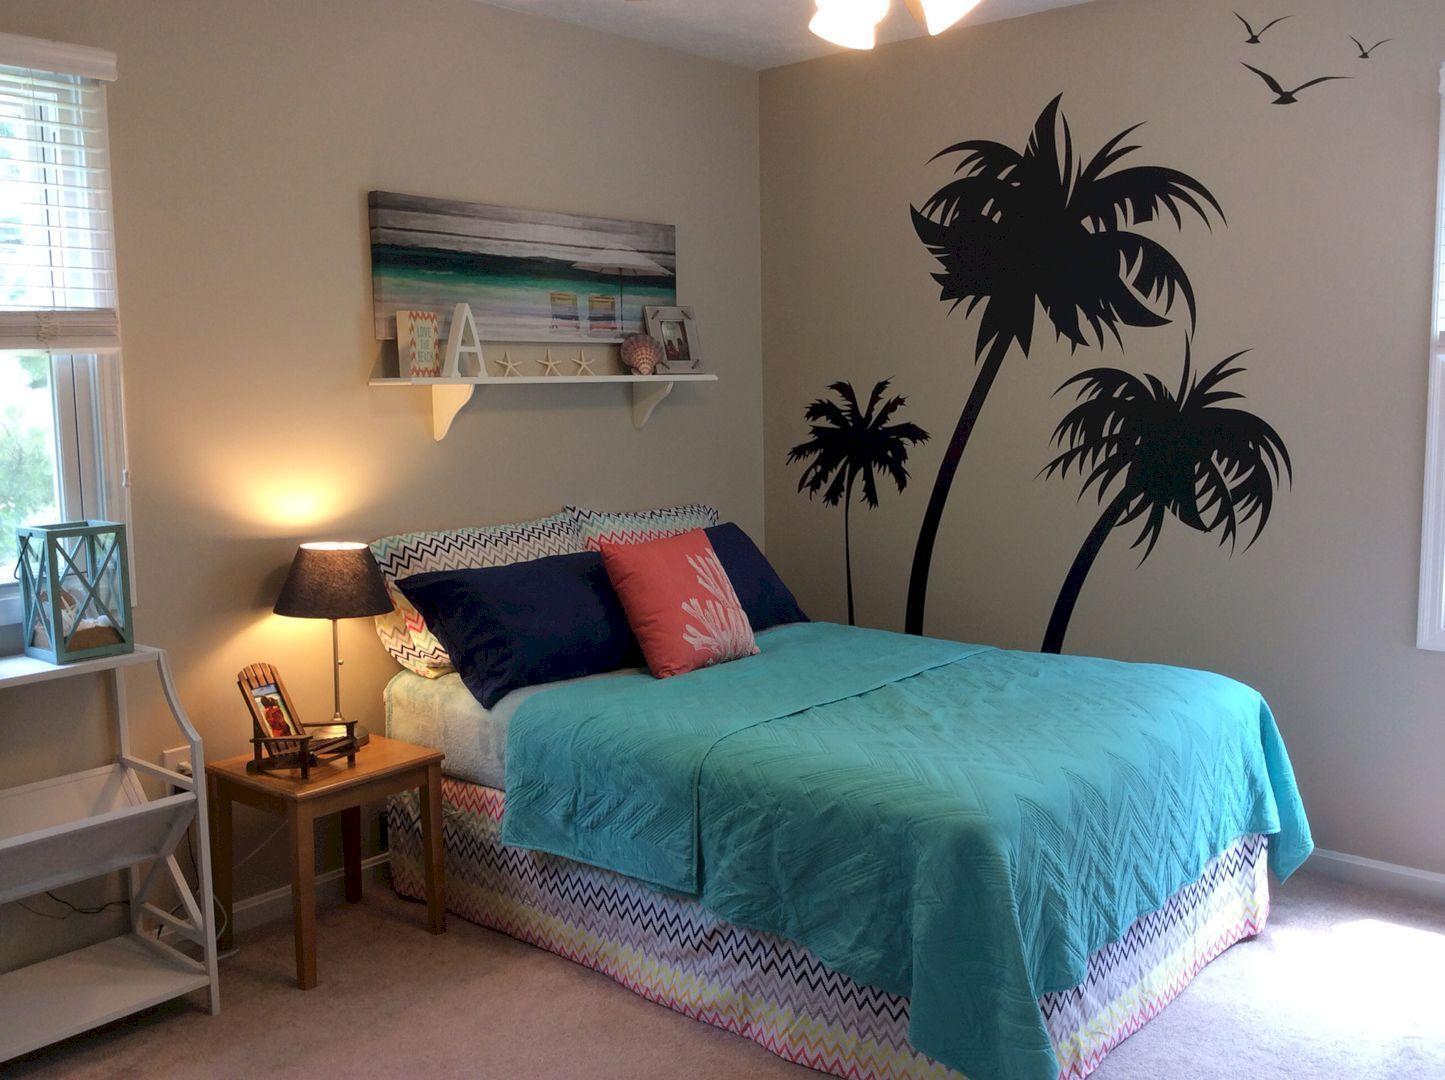 Merveilleux Awesome Teen Bedroom Interior Ideas  Https://www.futuristarchitecture.com/23866